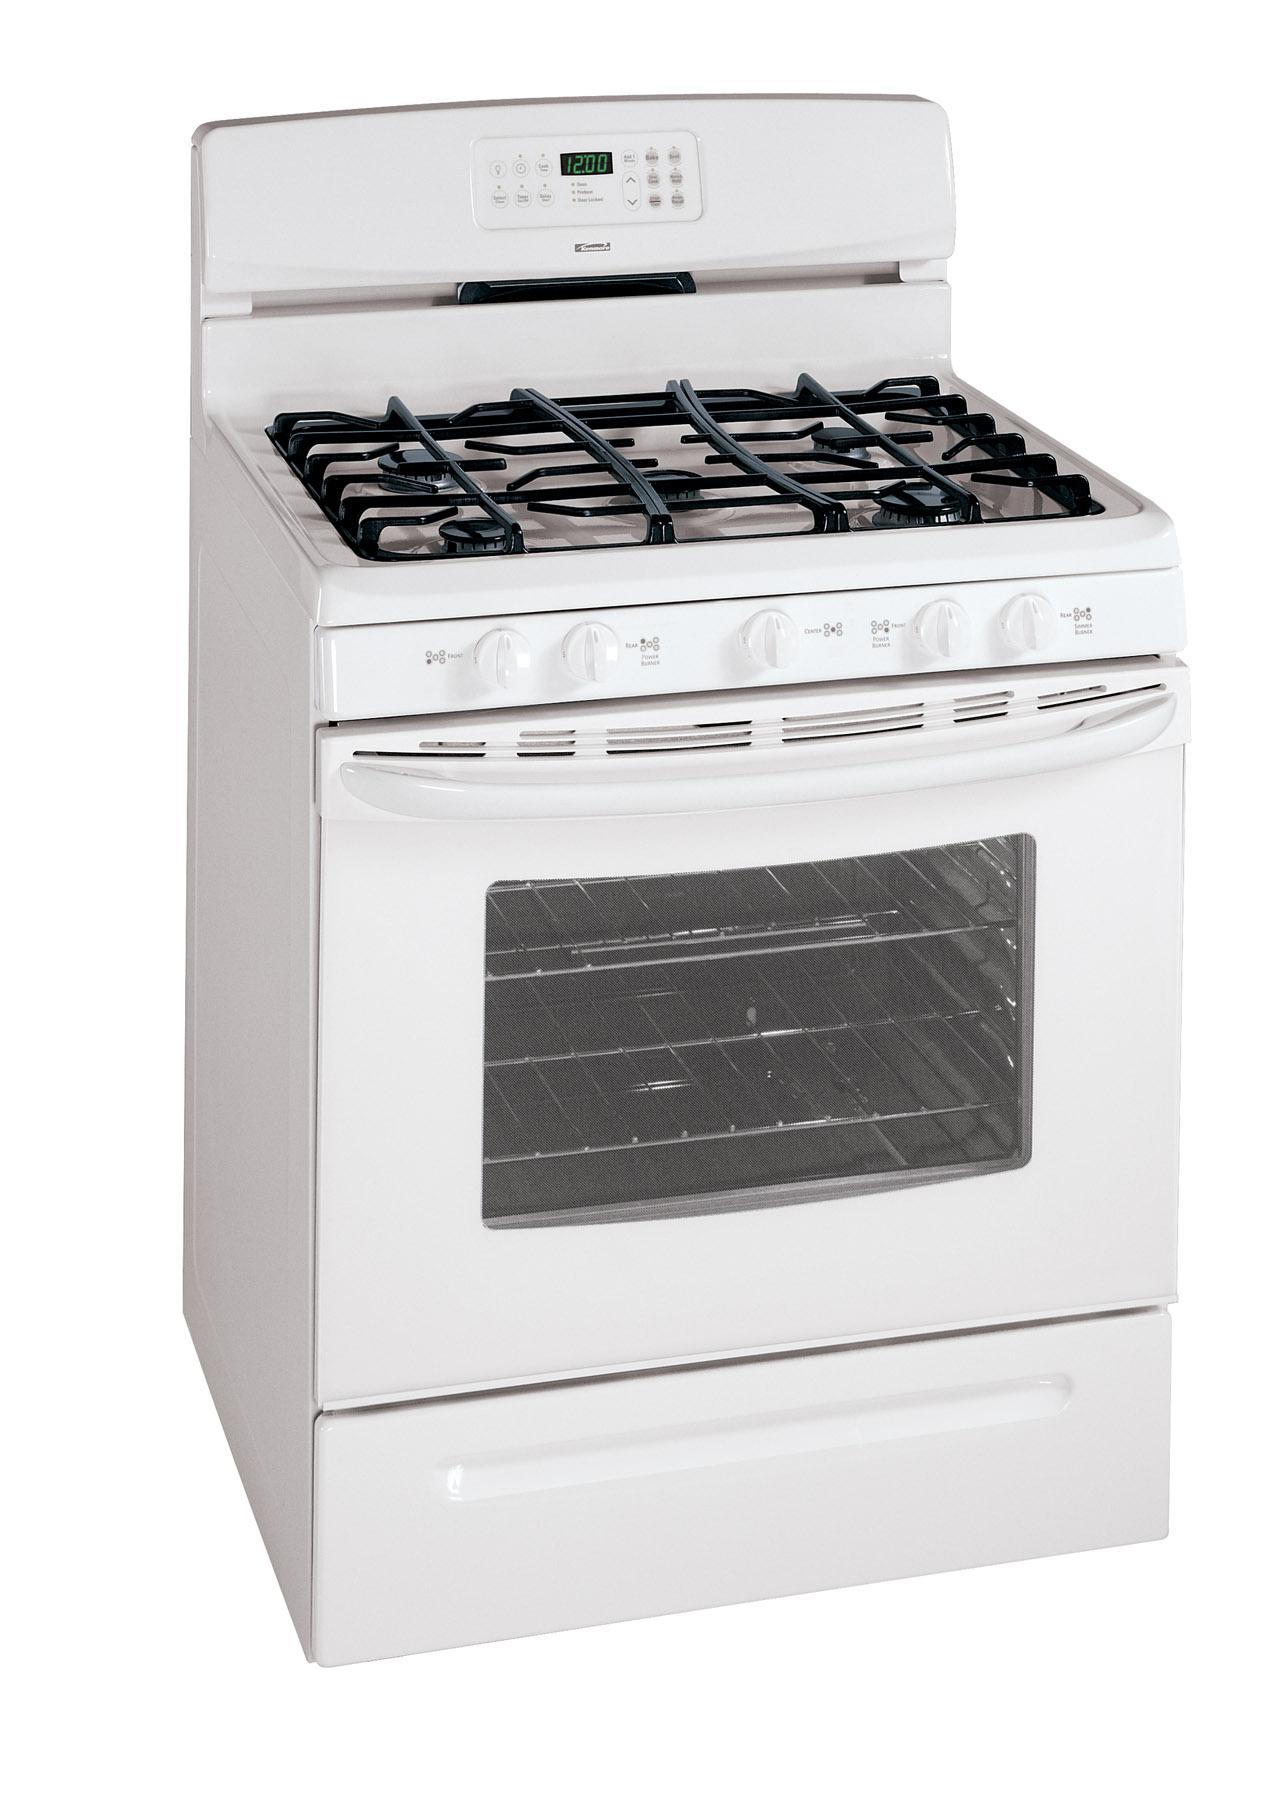 Kenmore Range/Stove/Oven Model 790.71382700 Parts